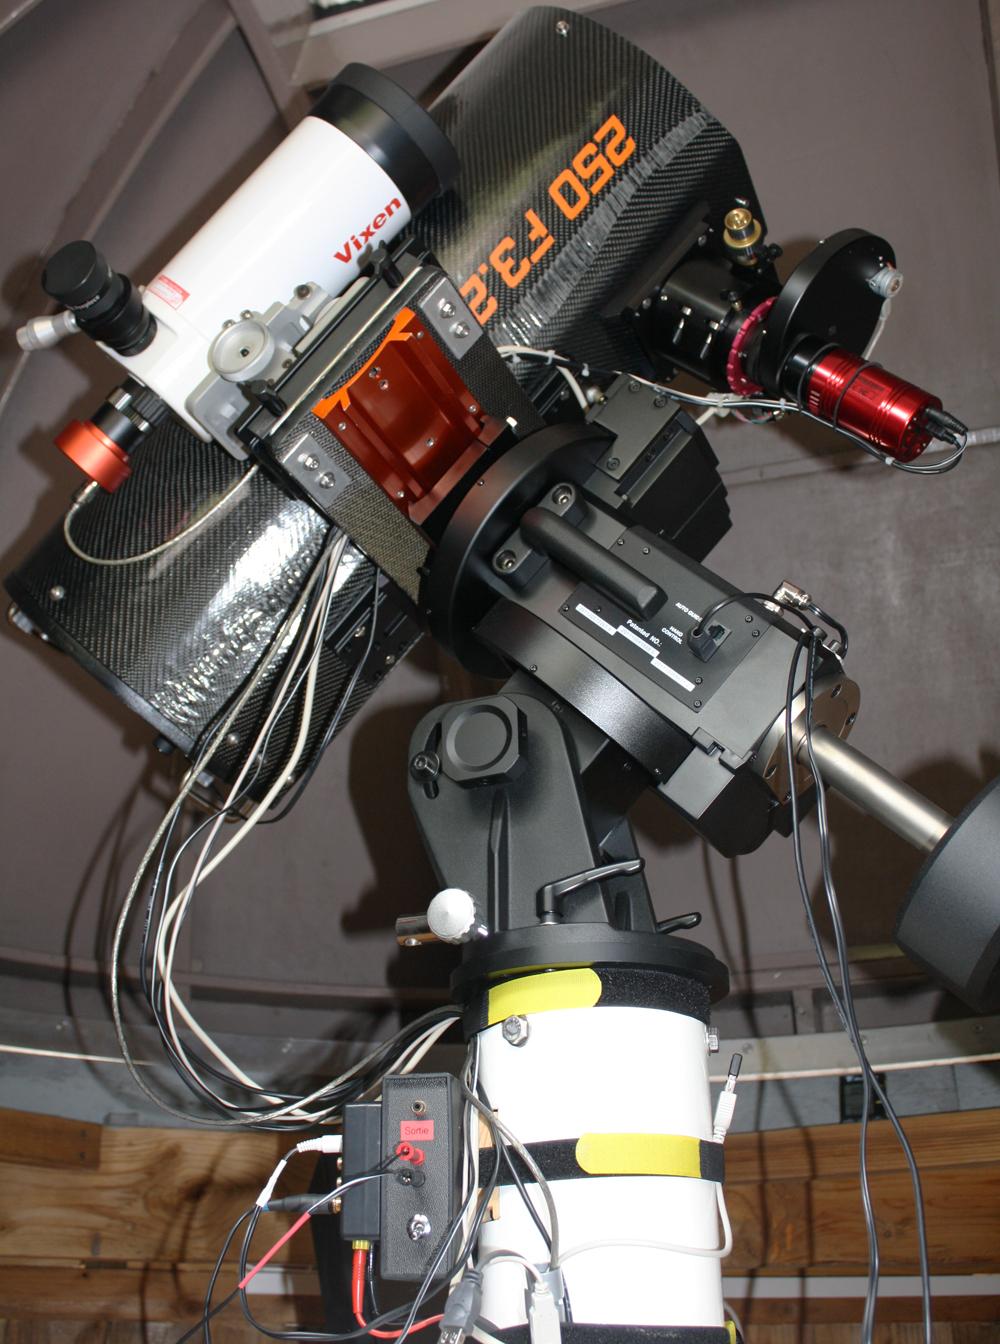 Construction astrographe de 250 F3.2 en carbone 733855AN2502